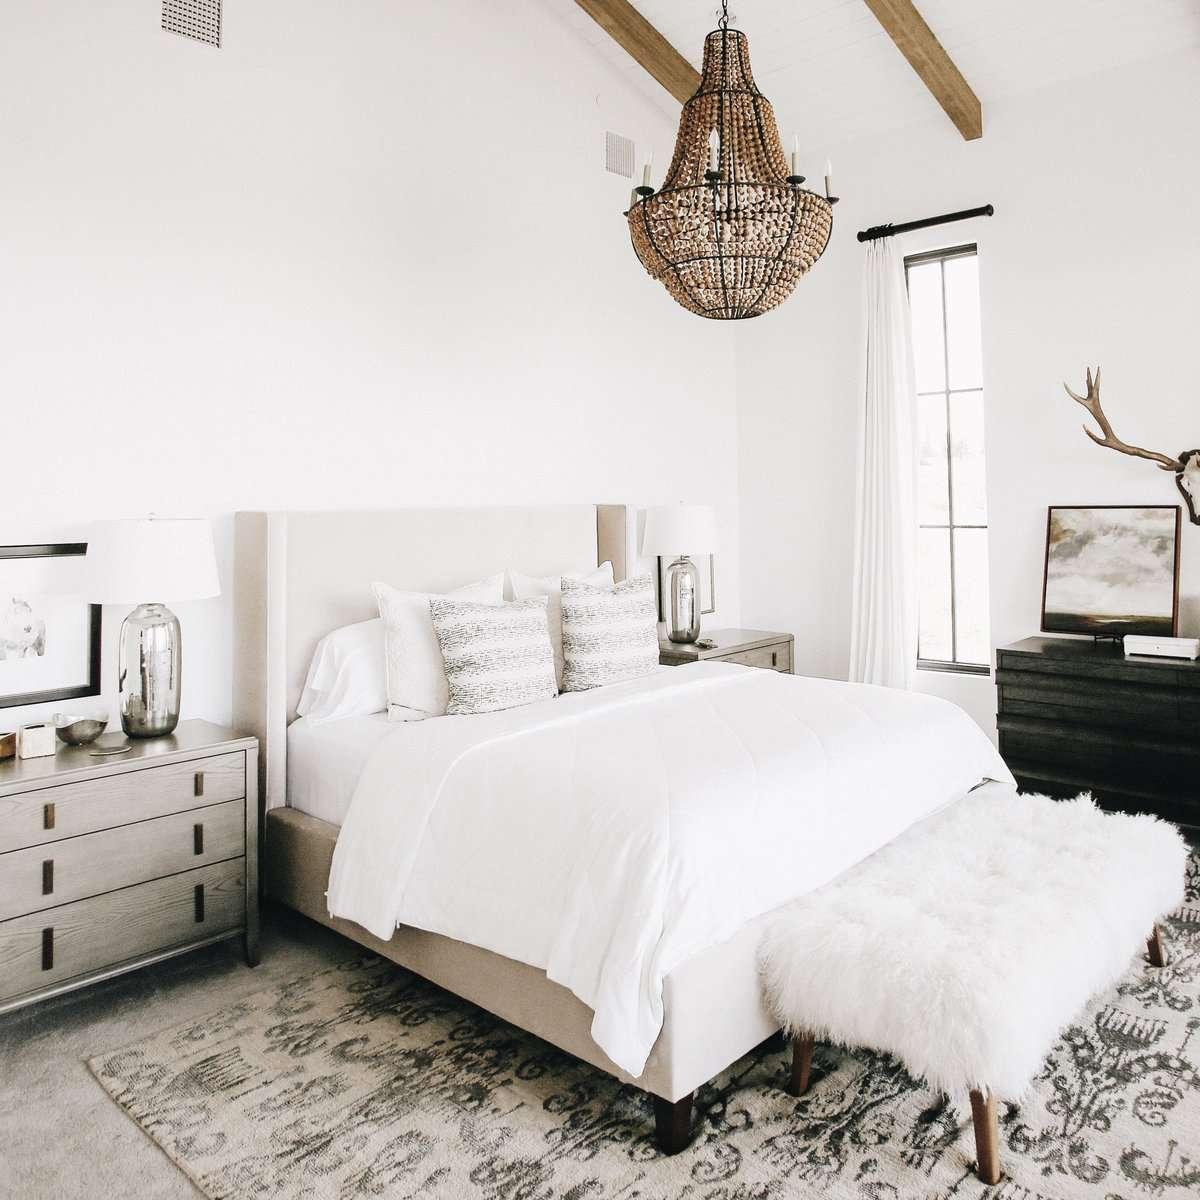 All-White Bedding